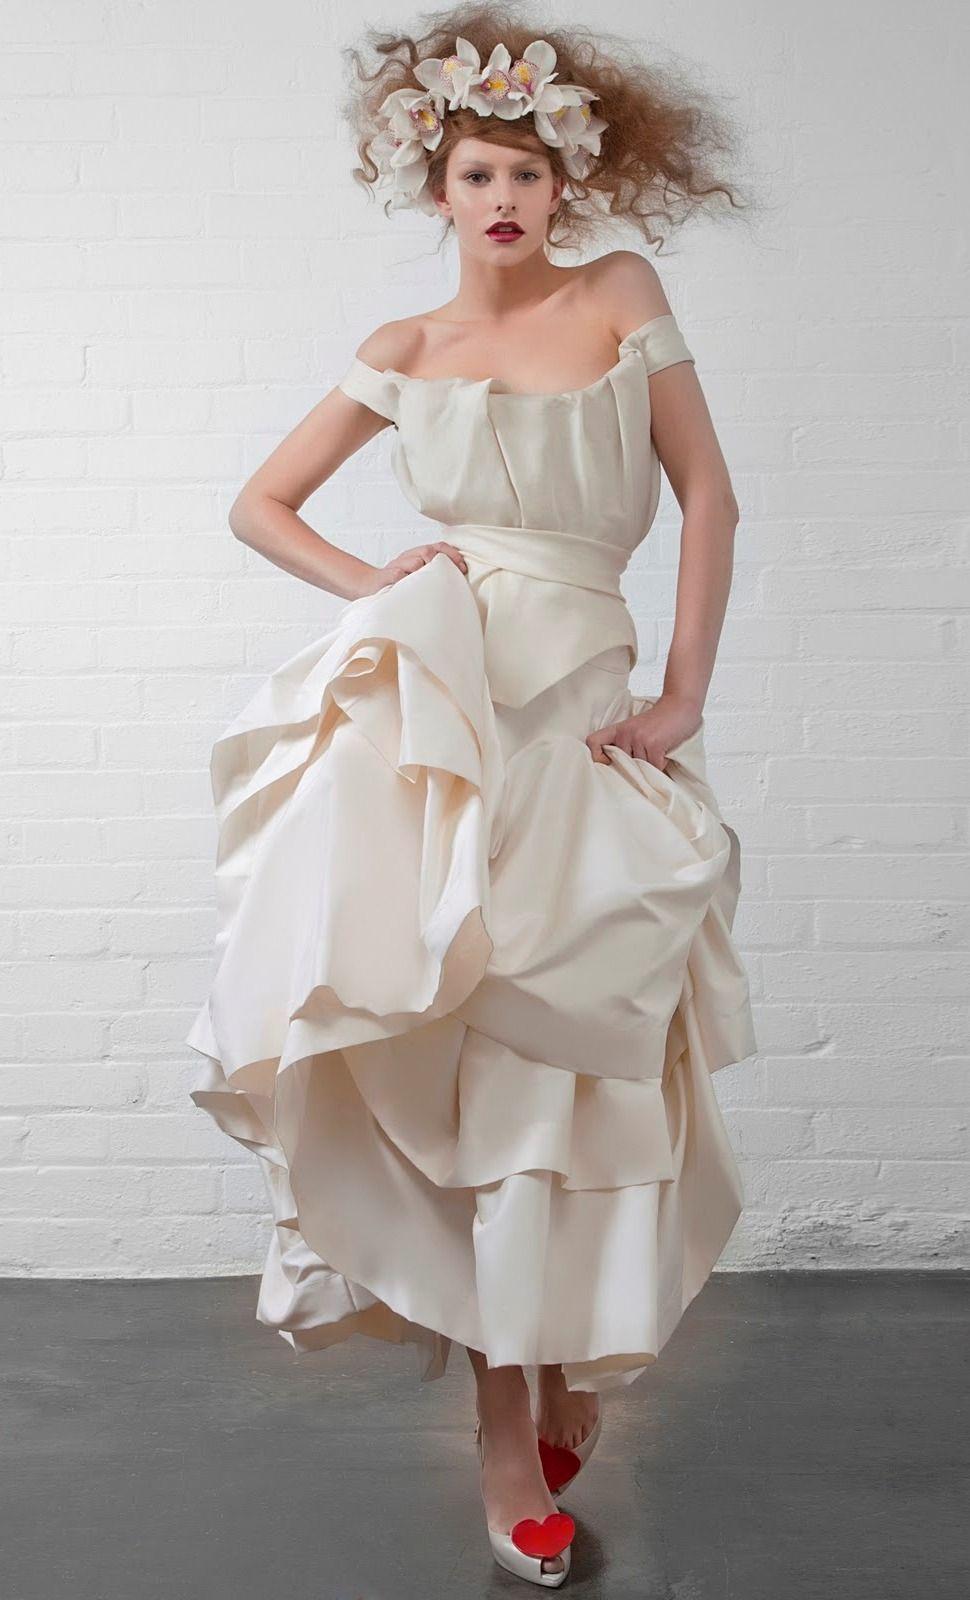 19+ Vivienne westwood wedding dress for sale ideas